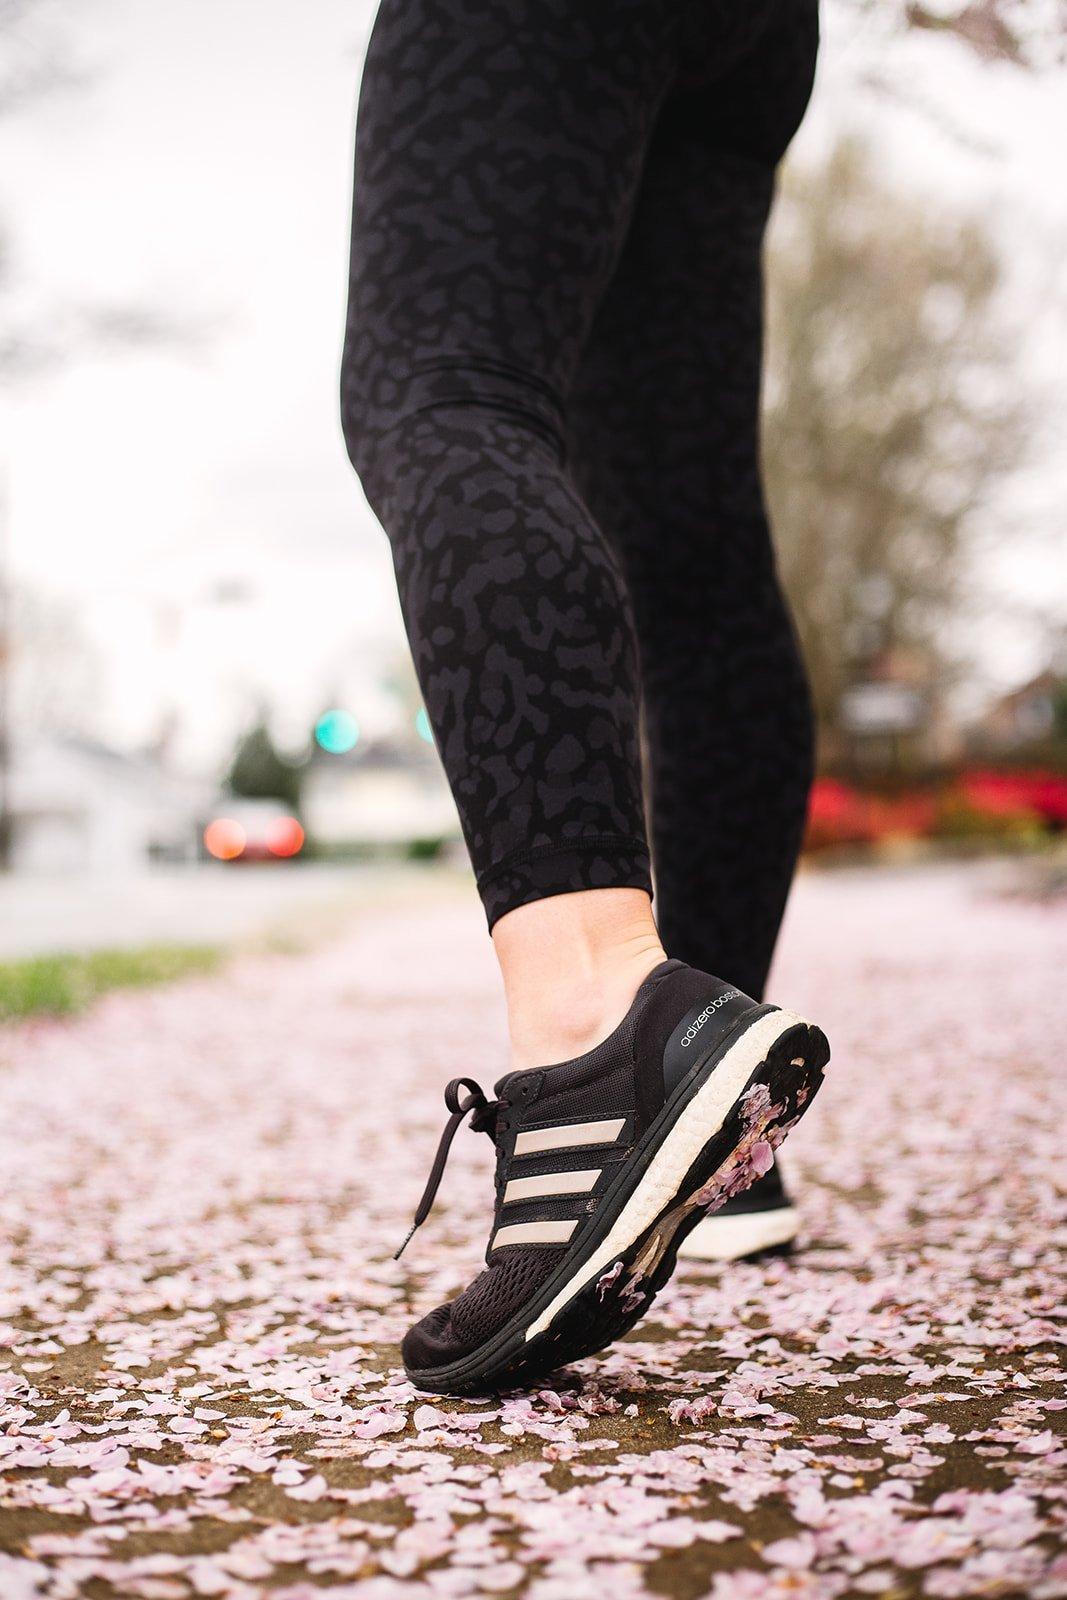 How To Make Running Shoes Last Longer